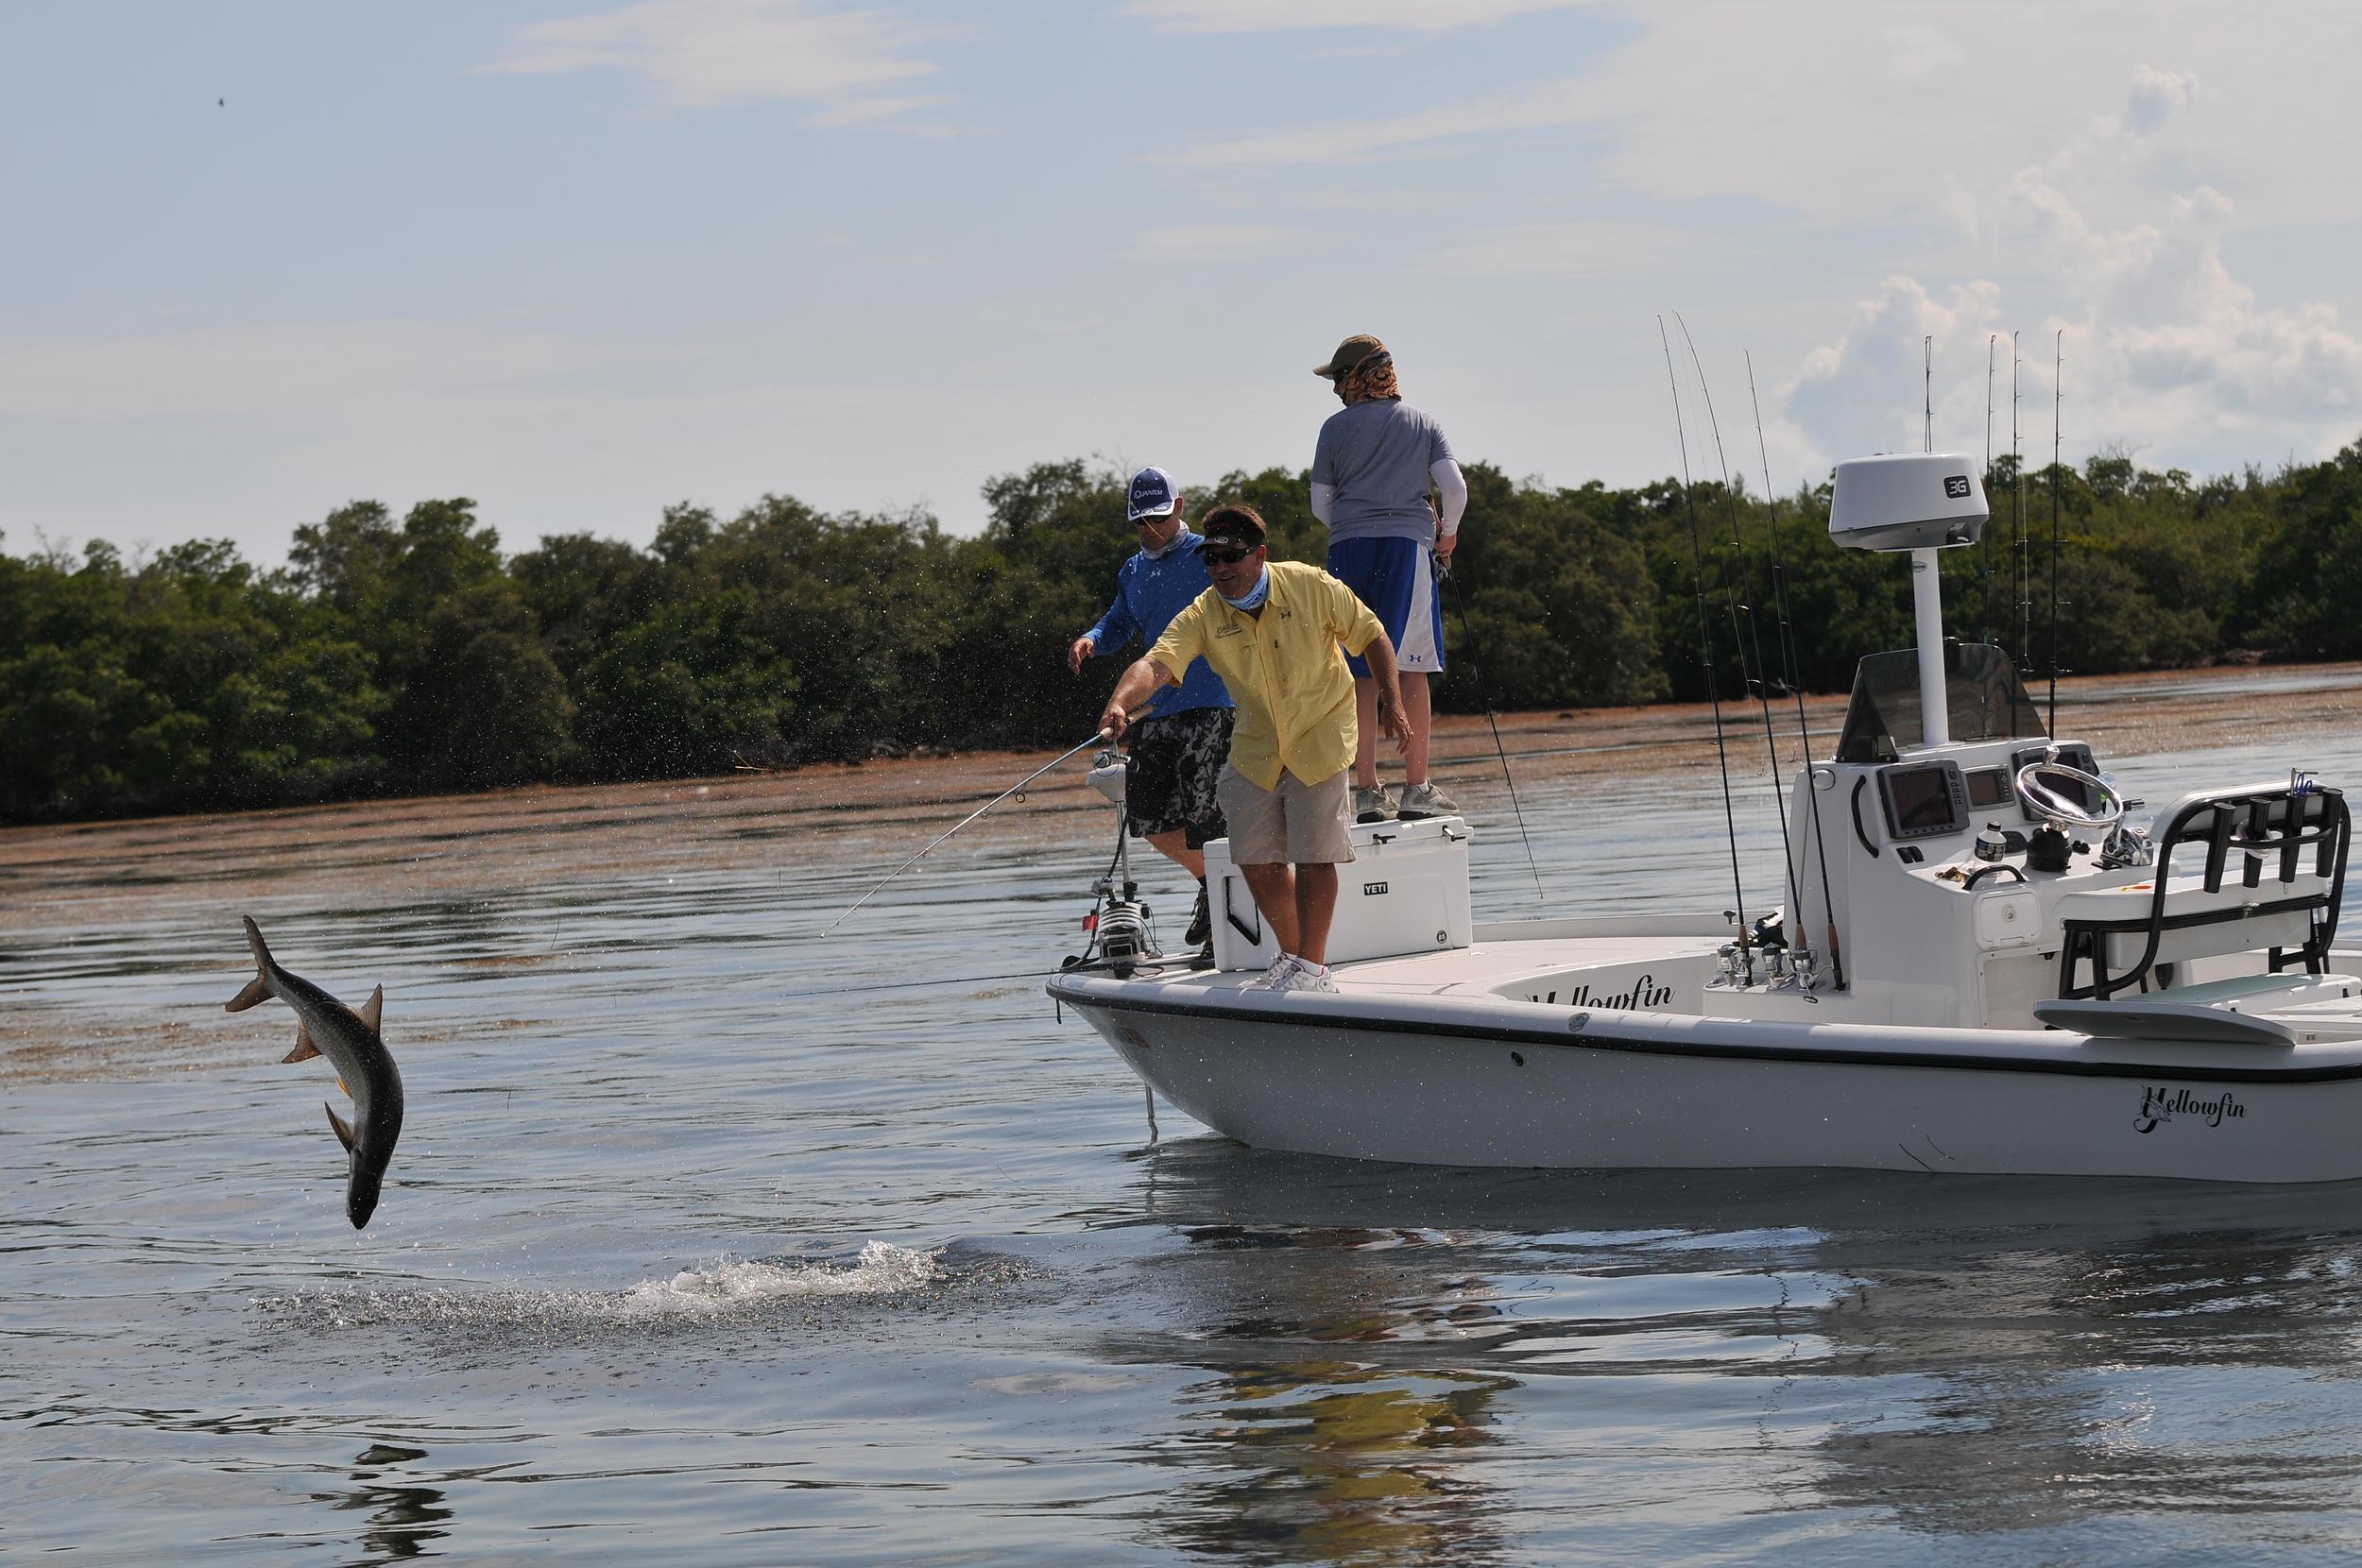 Rich tutor from saltwater experience jumps a tarpon near big pine key, florida